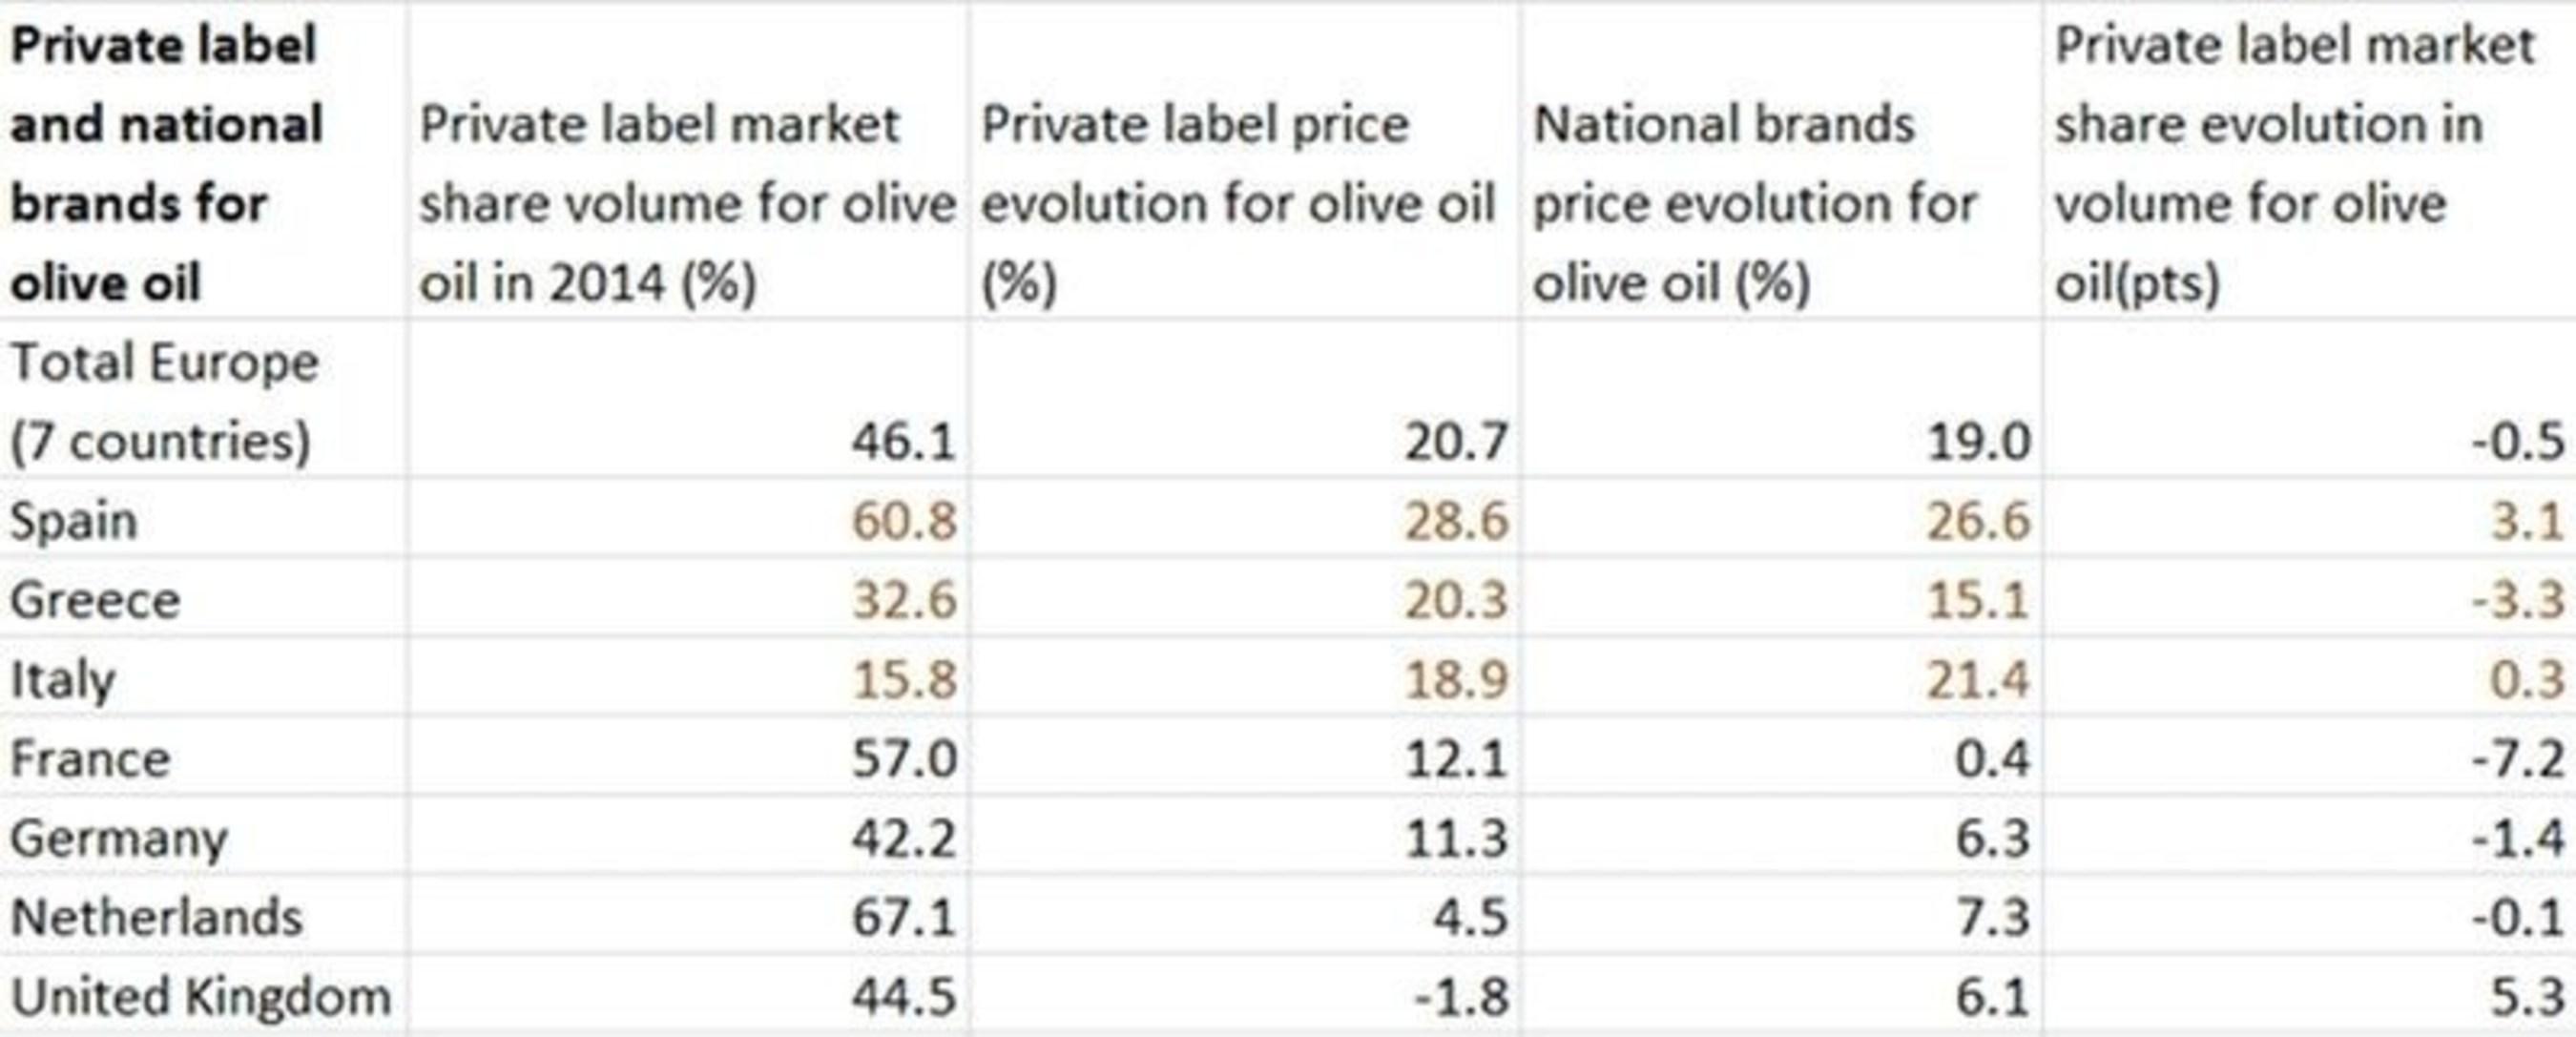 Private label olive oil sales in Western Europe for 2015 (PRNewsFoto/IRI)